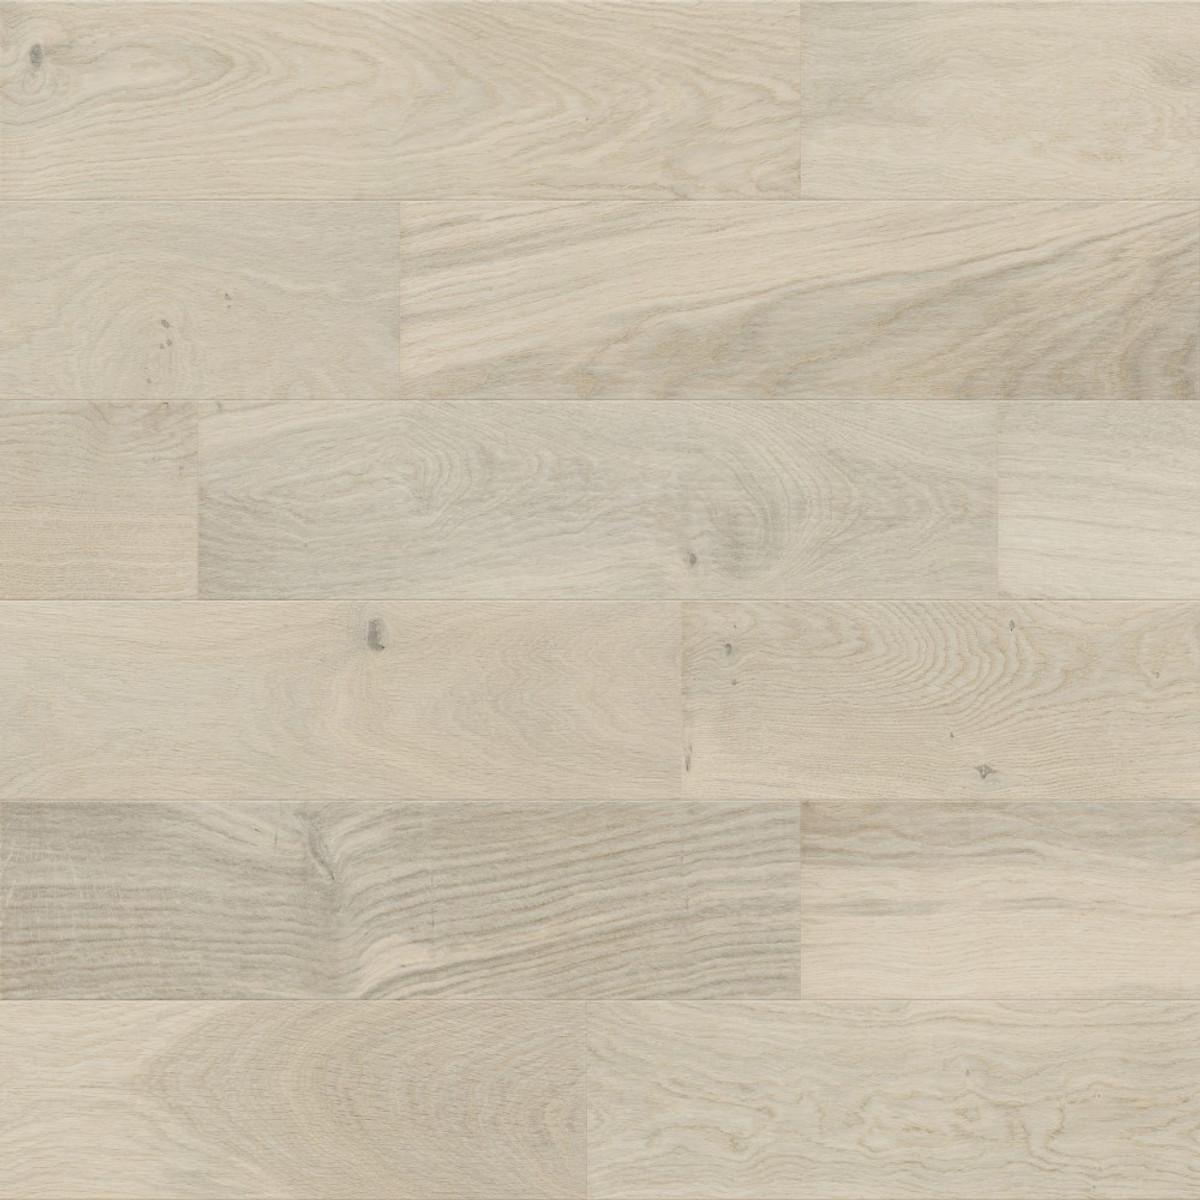 Tuscany Xpress Click Various Cream Engineered Wood Flooring ( Per 2.26m2 Pack ) www.tuscanytiles.co.uk